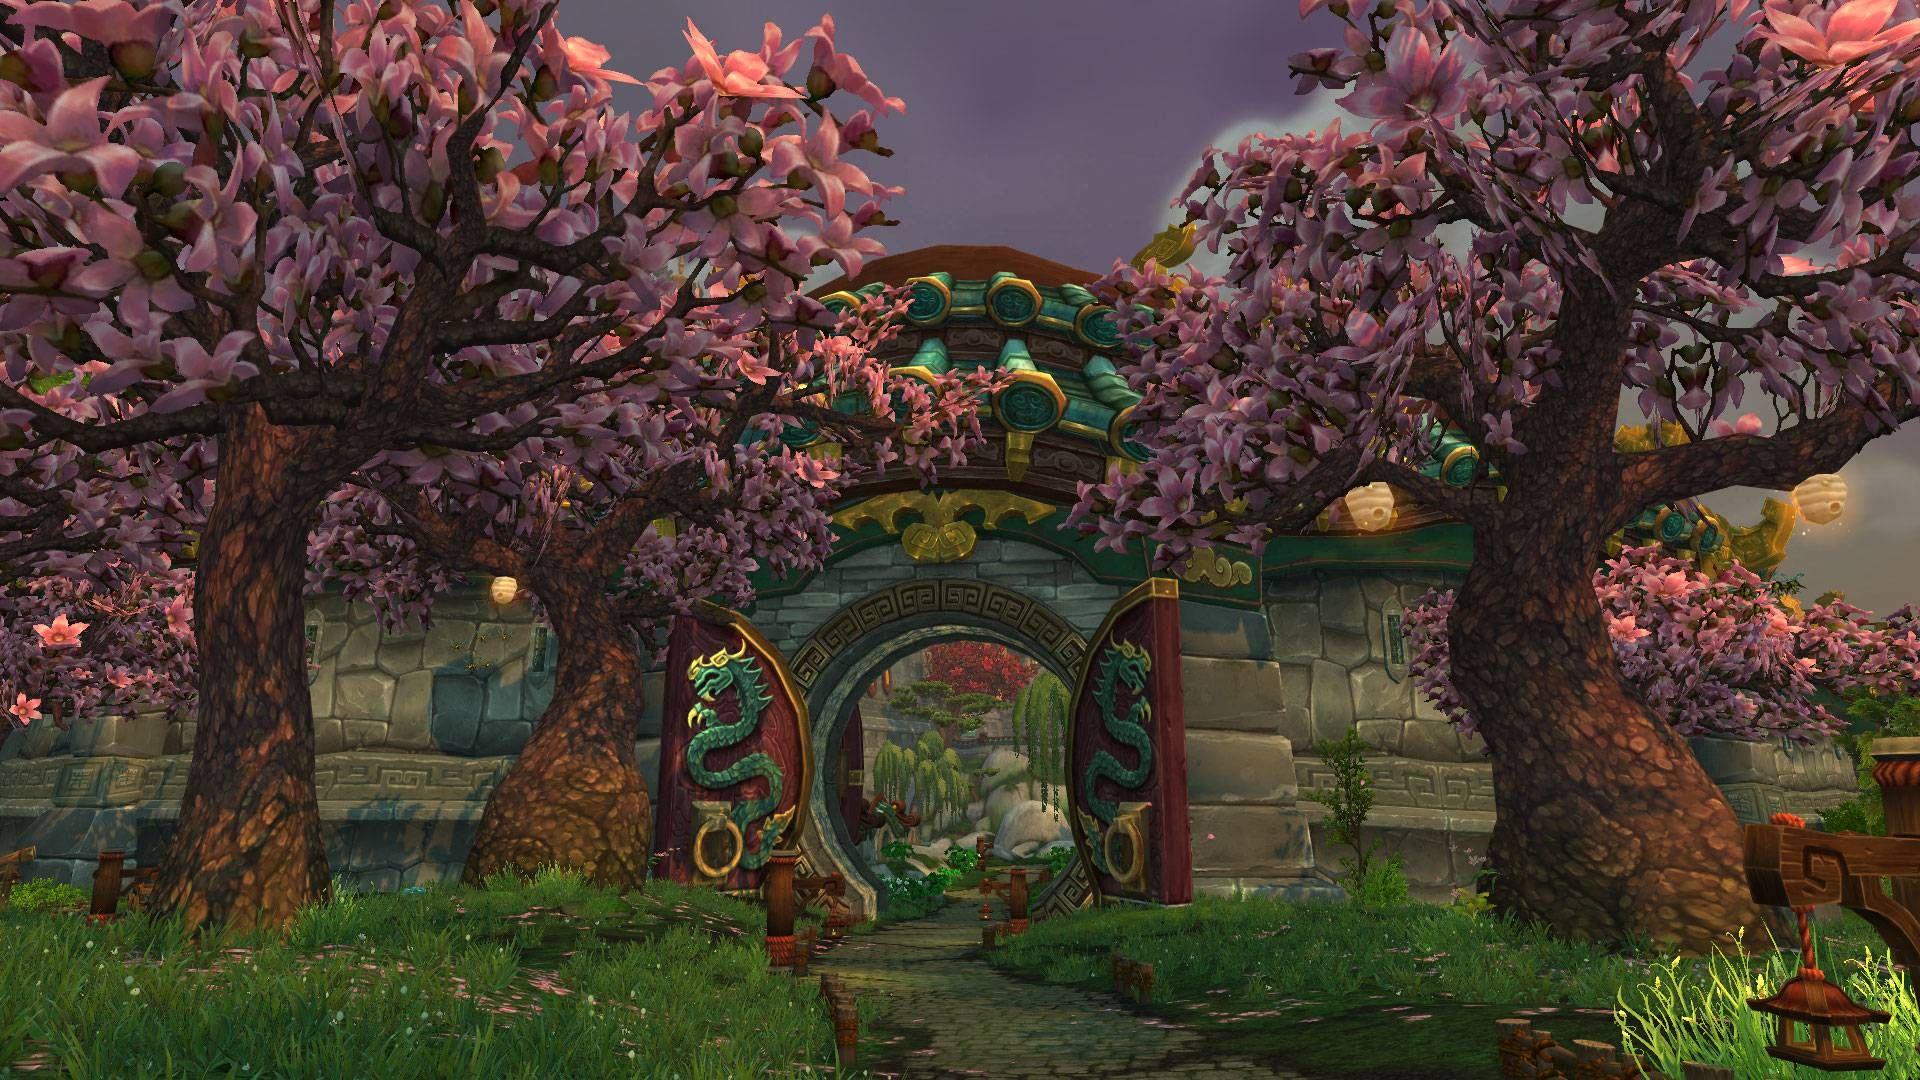 World Of Warcraft Cherry Blossom Trees Screenshot 1920x1080 Cherry Blossom Tree World Of Warcraft Warcraft